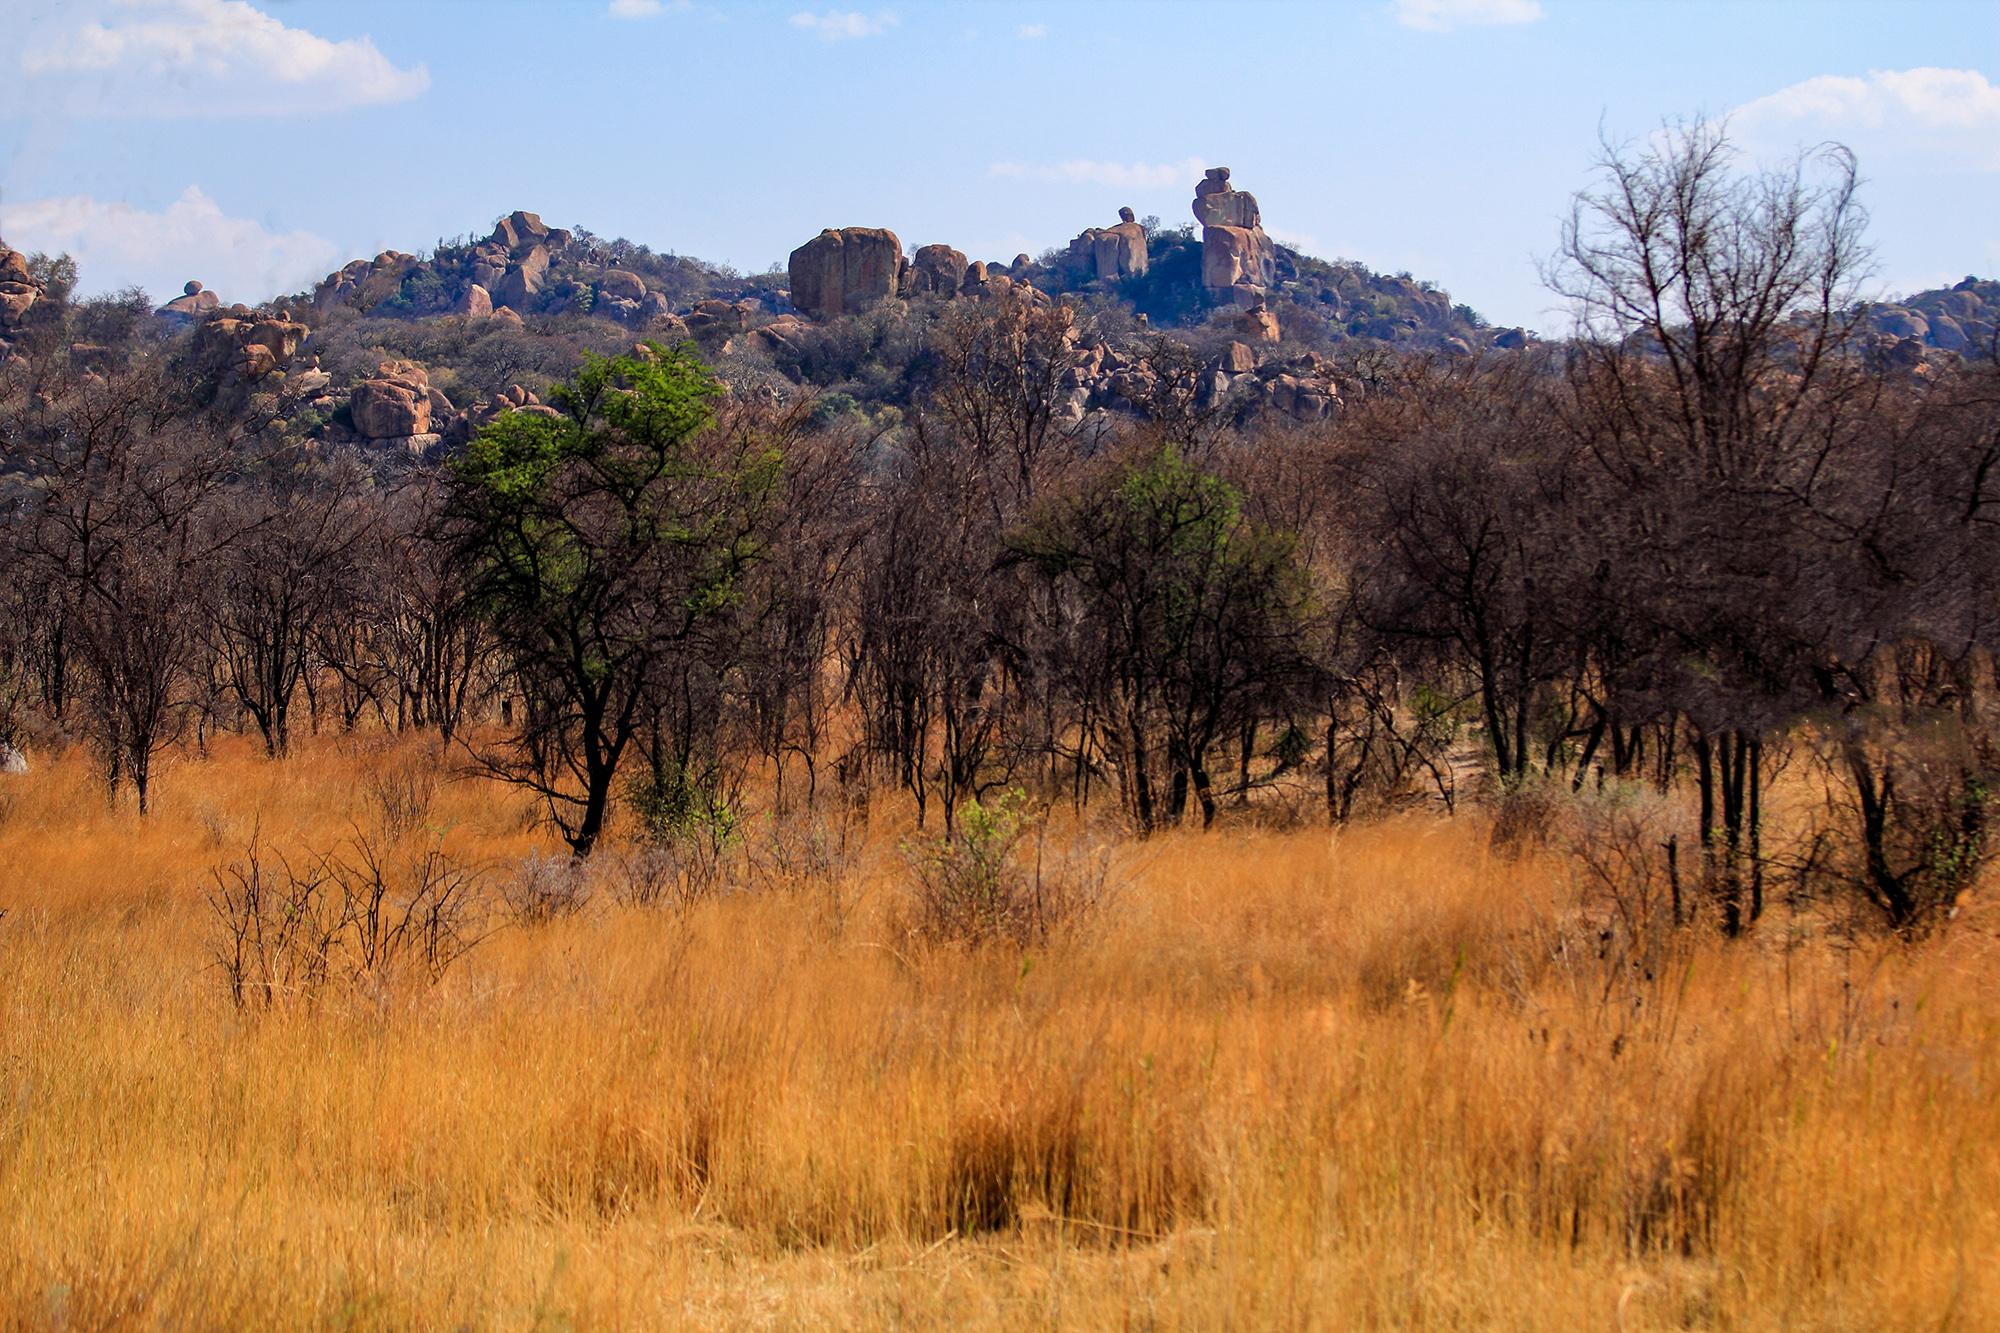 Matobo National Park au Zimbabwe par Guillaume Projetti